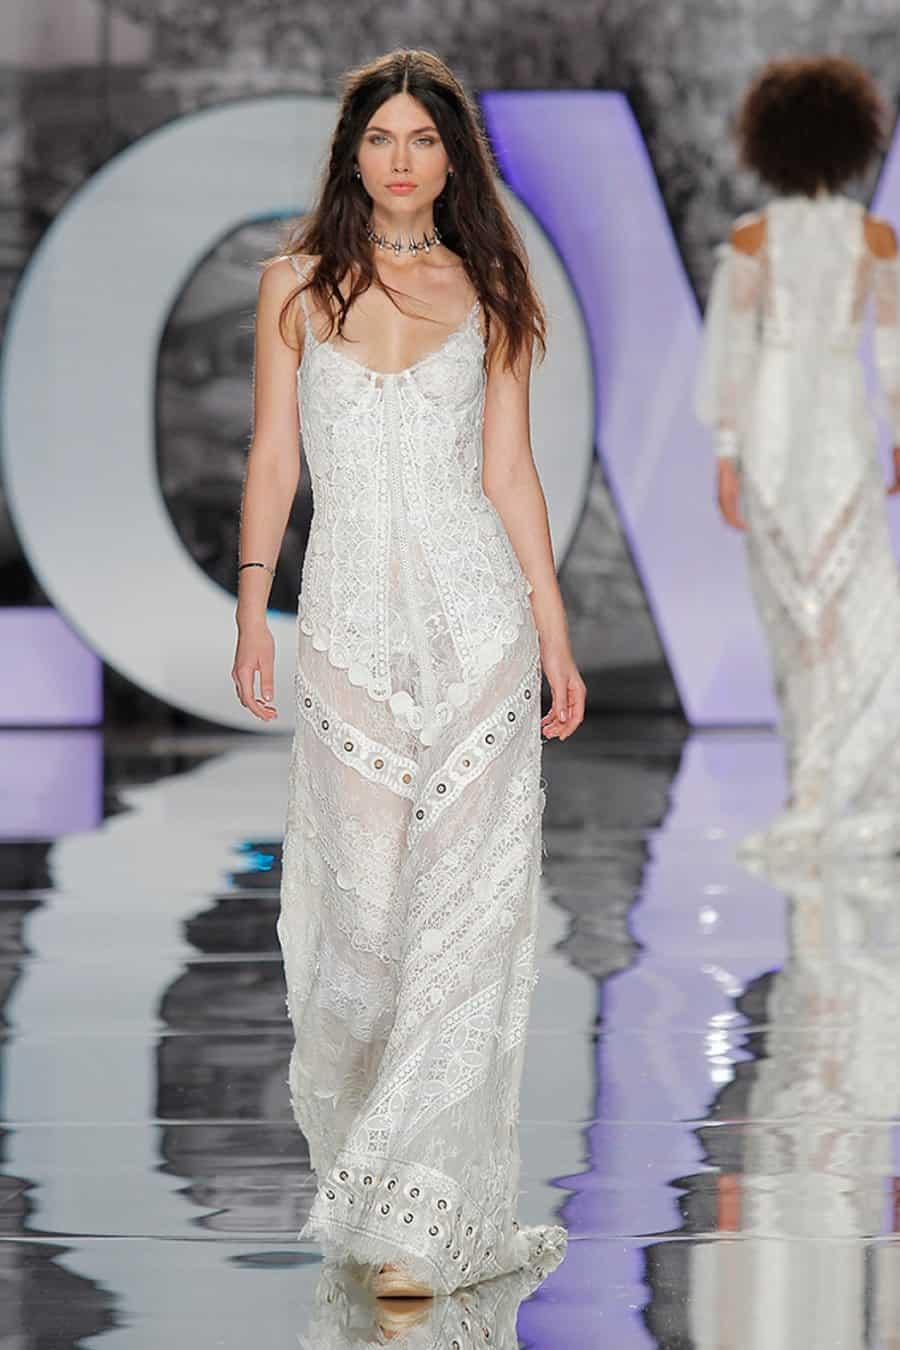 yolancris-weddingdress-bride-boho-chic-folk-wedding-dress-couture-fashion-desing-bohodress-83